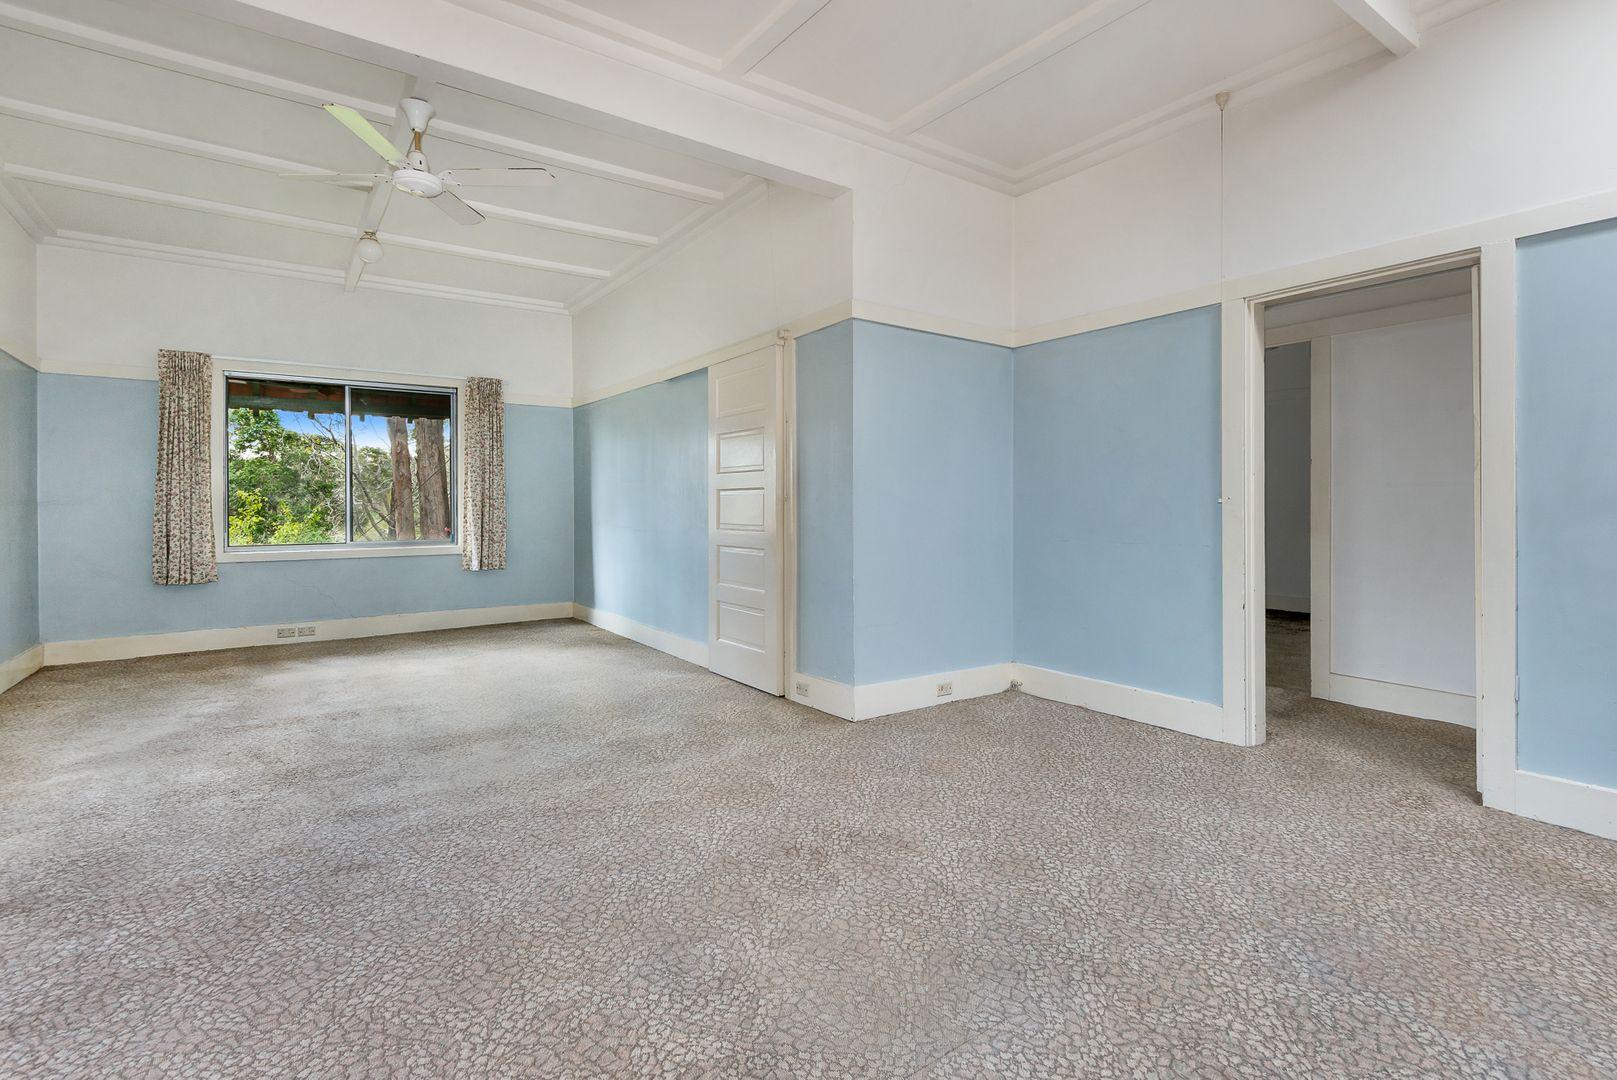 54 Moree Street, Gordon NSW 2072, Image 2